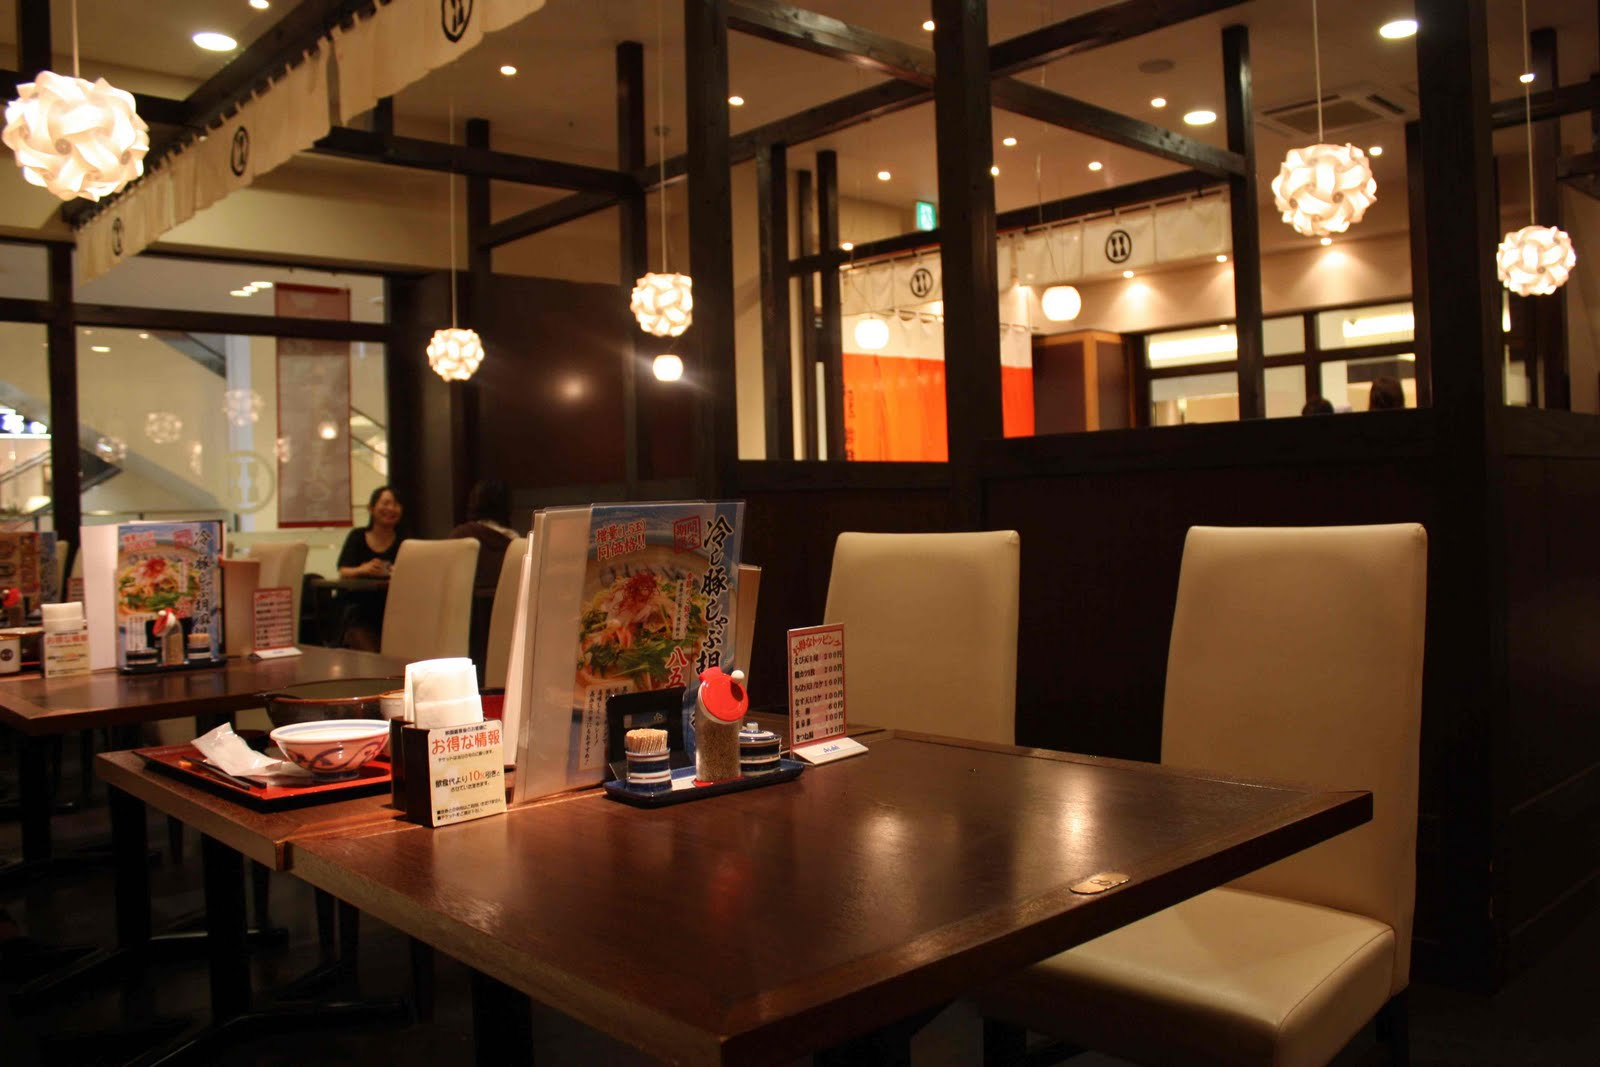 Negotiating A Restaurant Food And Beverage Minimum